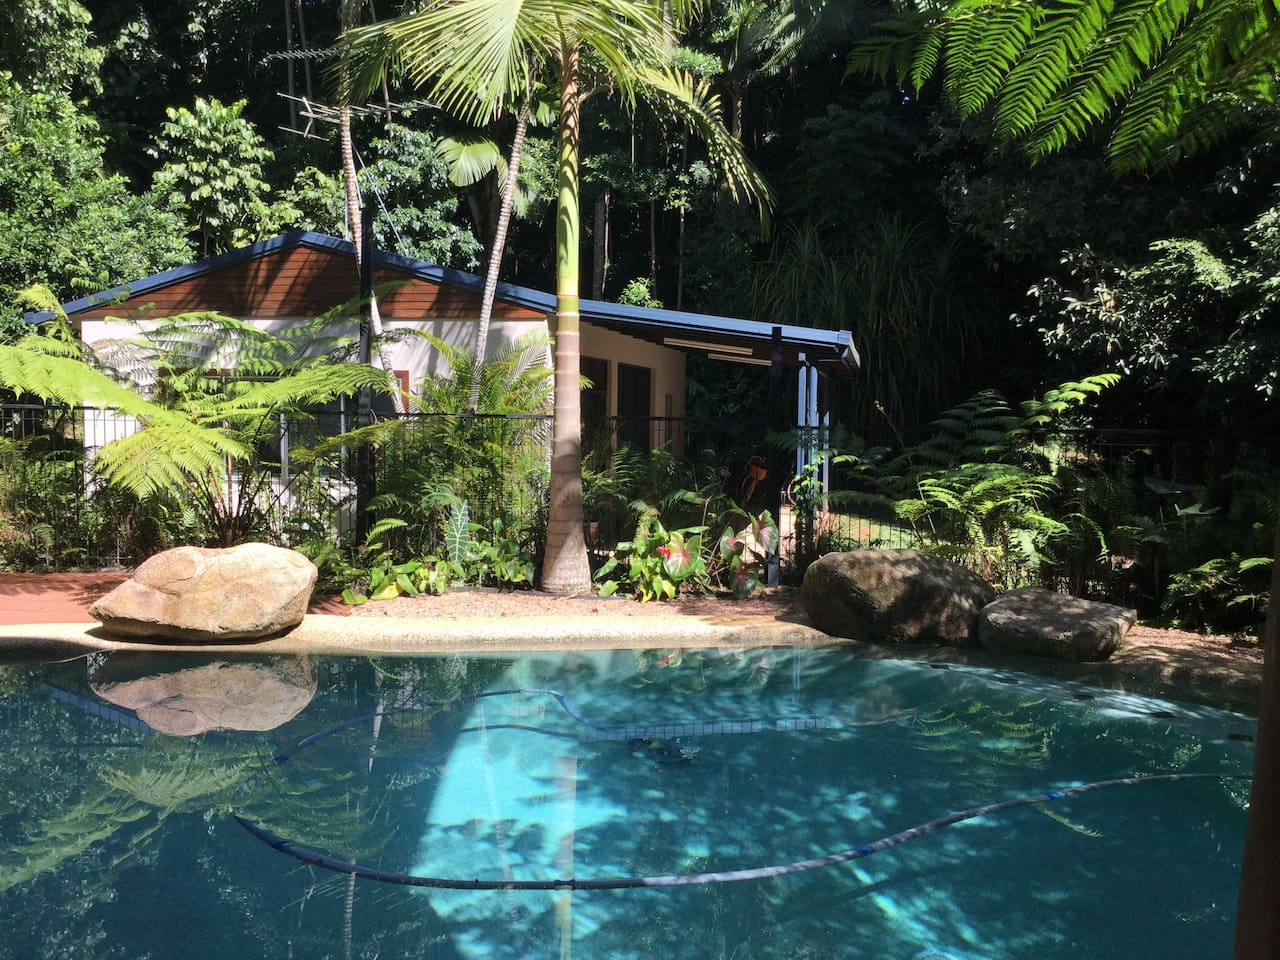 Tropical garden setting pool